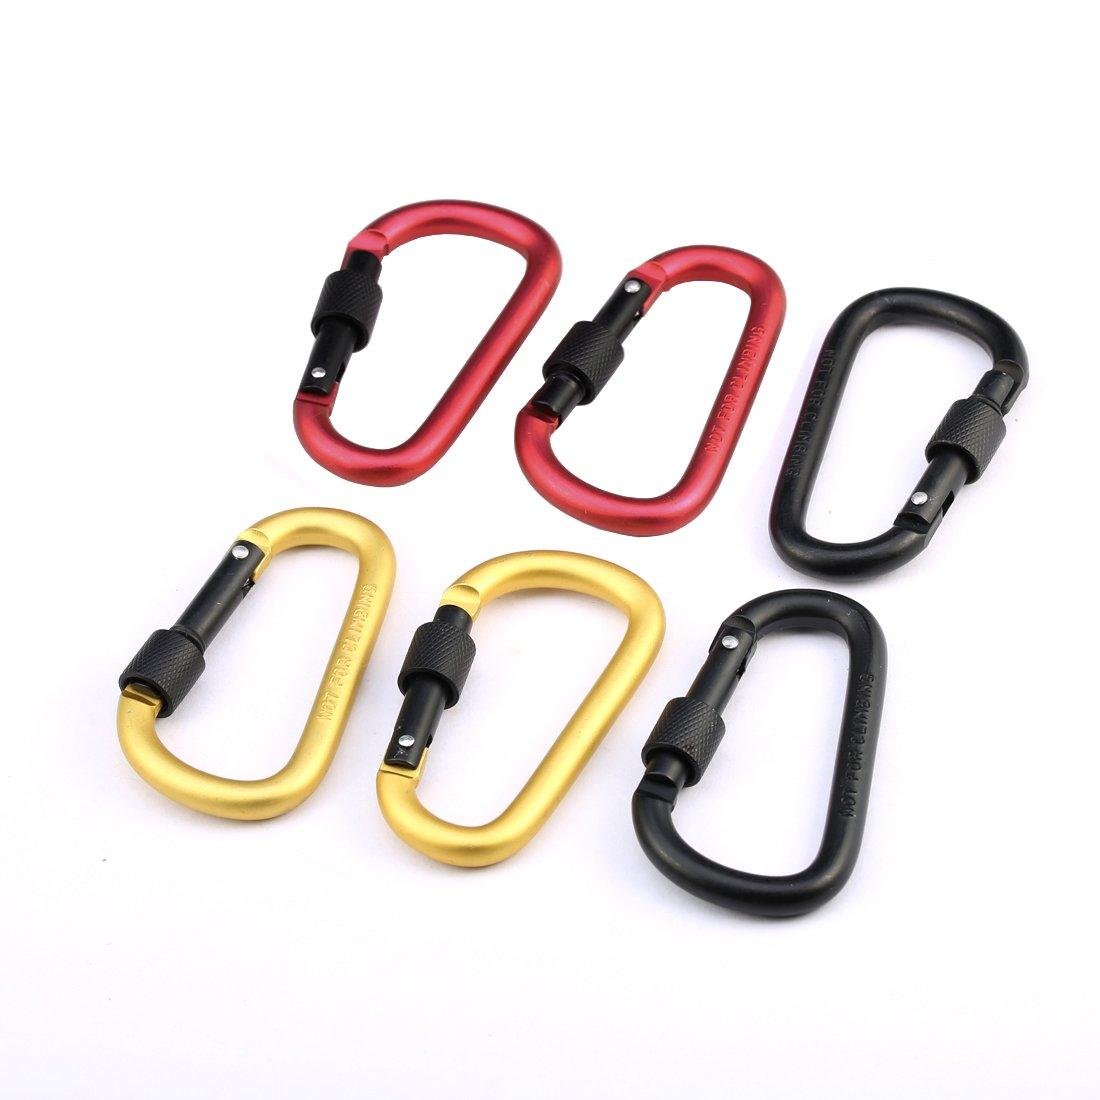 Big size Solid Titanium Key ring holder M6 snap hook clip Carabiner Ti141A